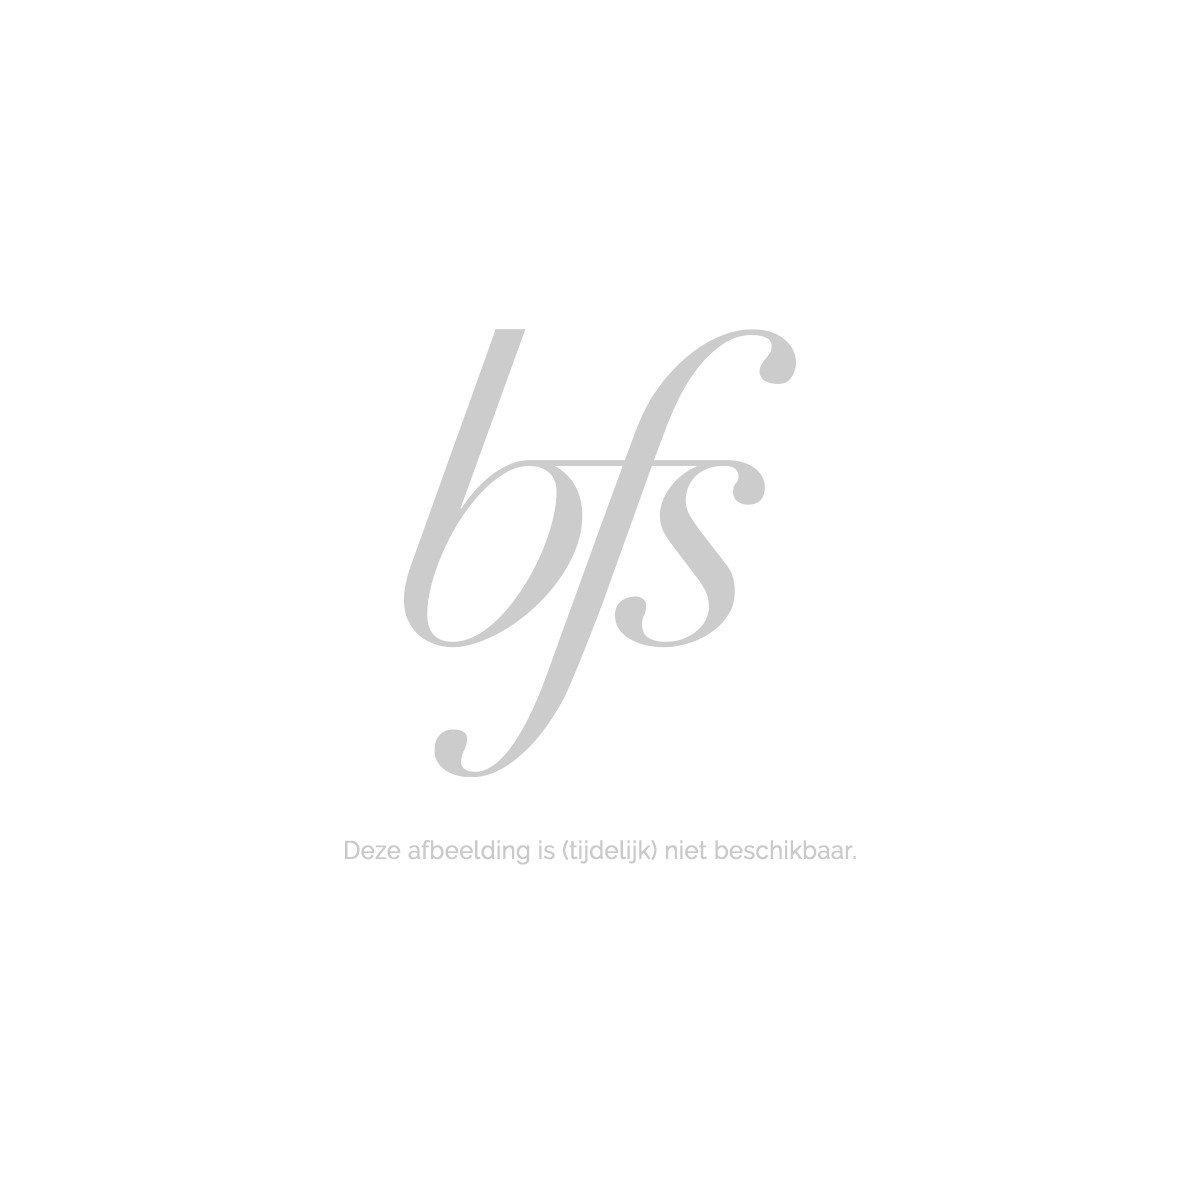 Michael Kors Wonderlust Sensual Essence Eau De Parfum 50 ml